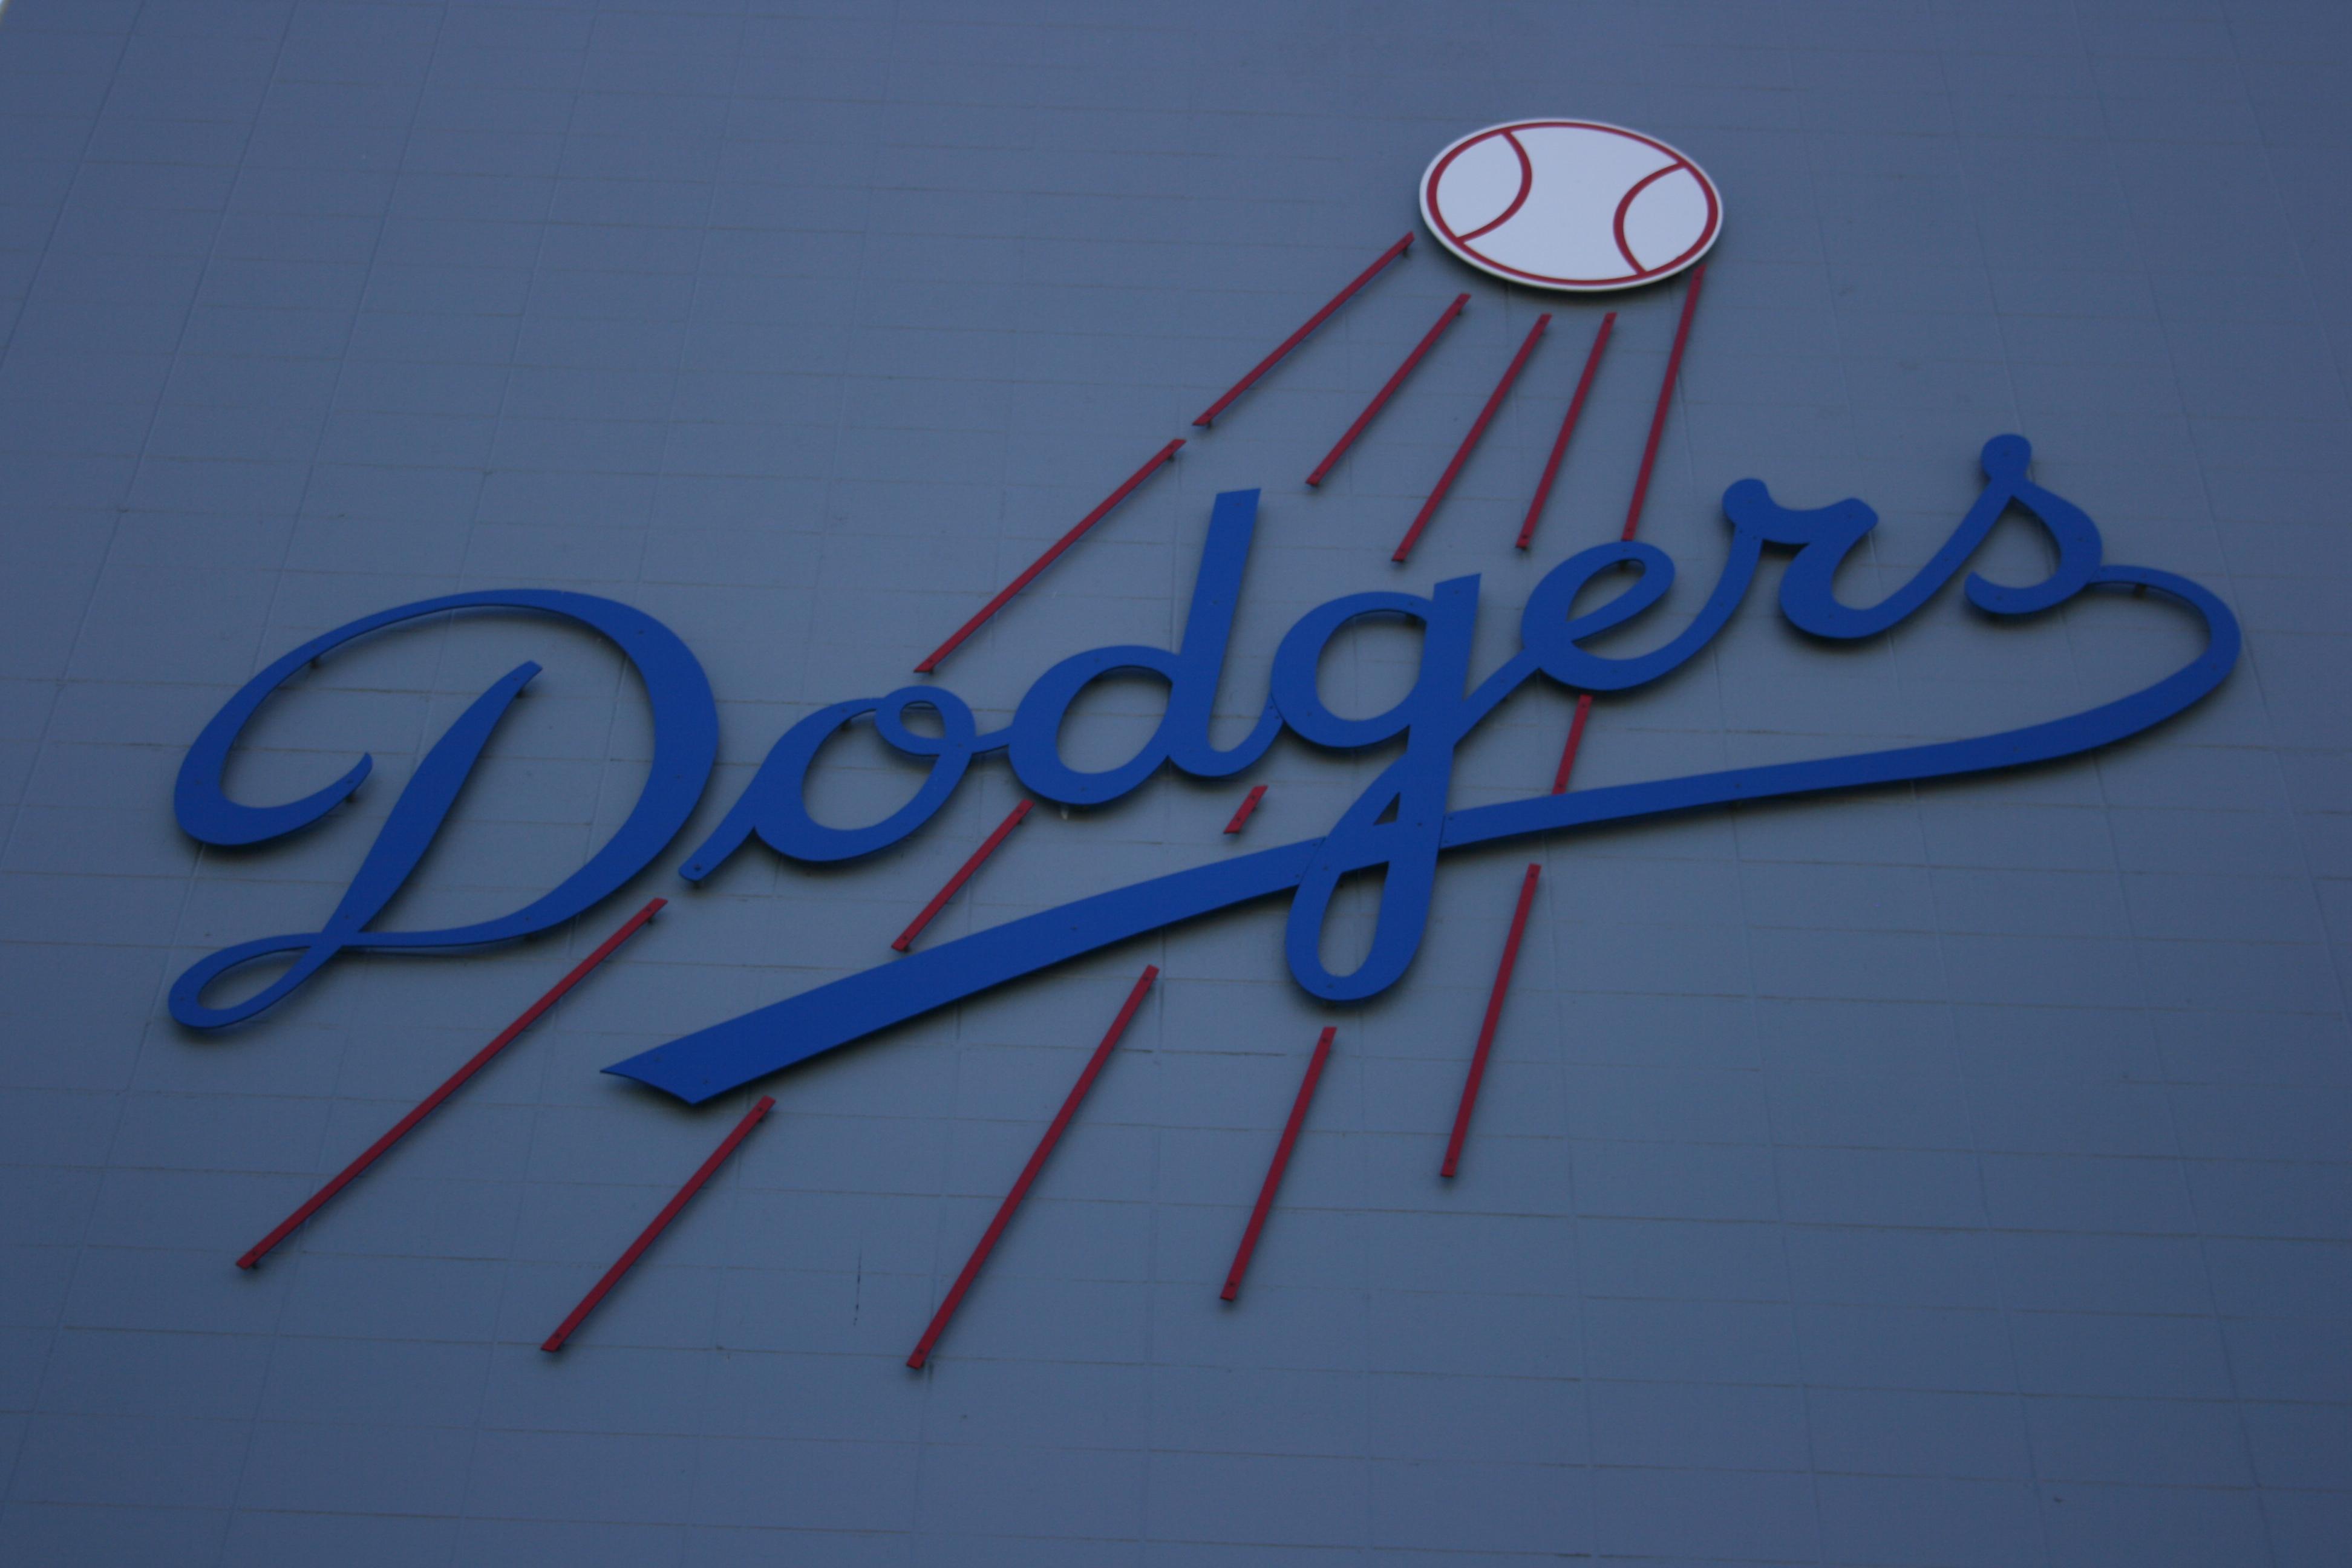 Dodgers logo 3888x2592